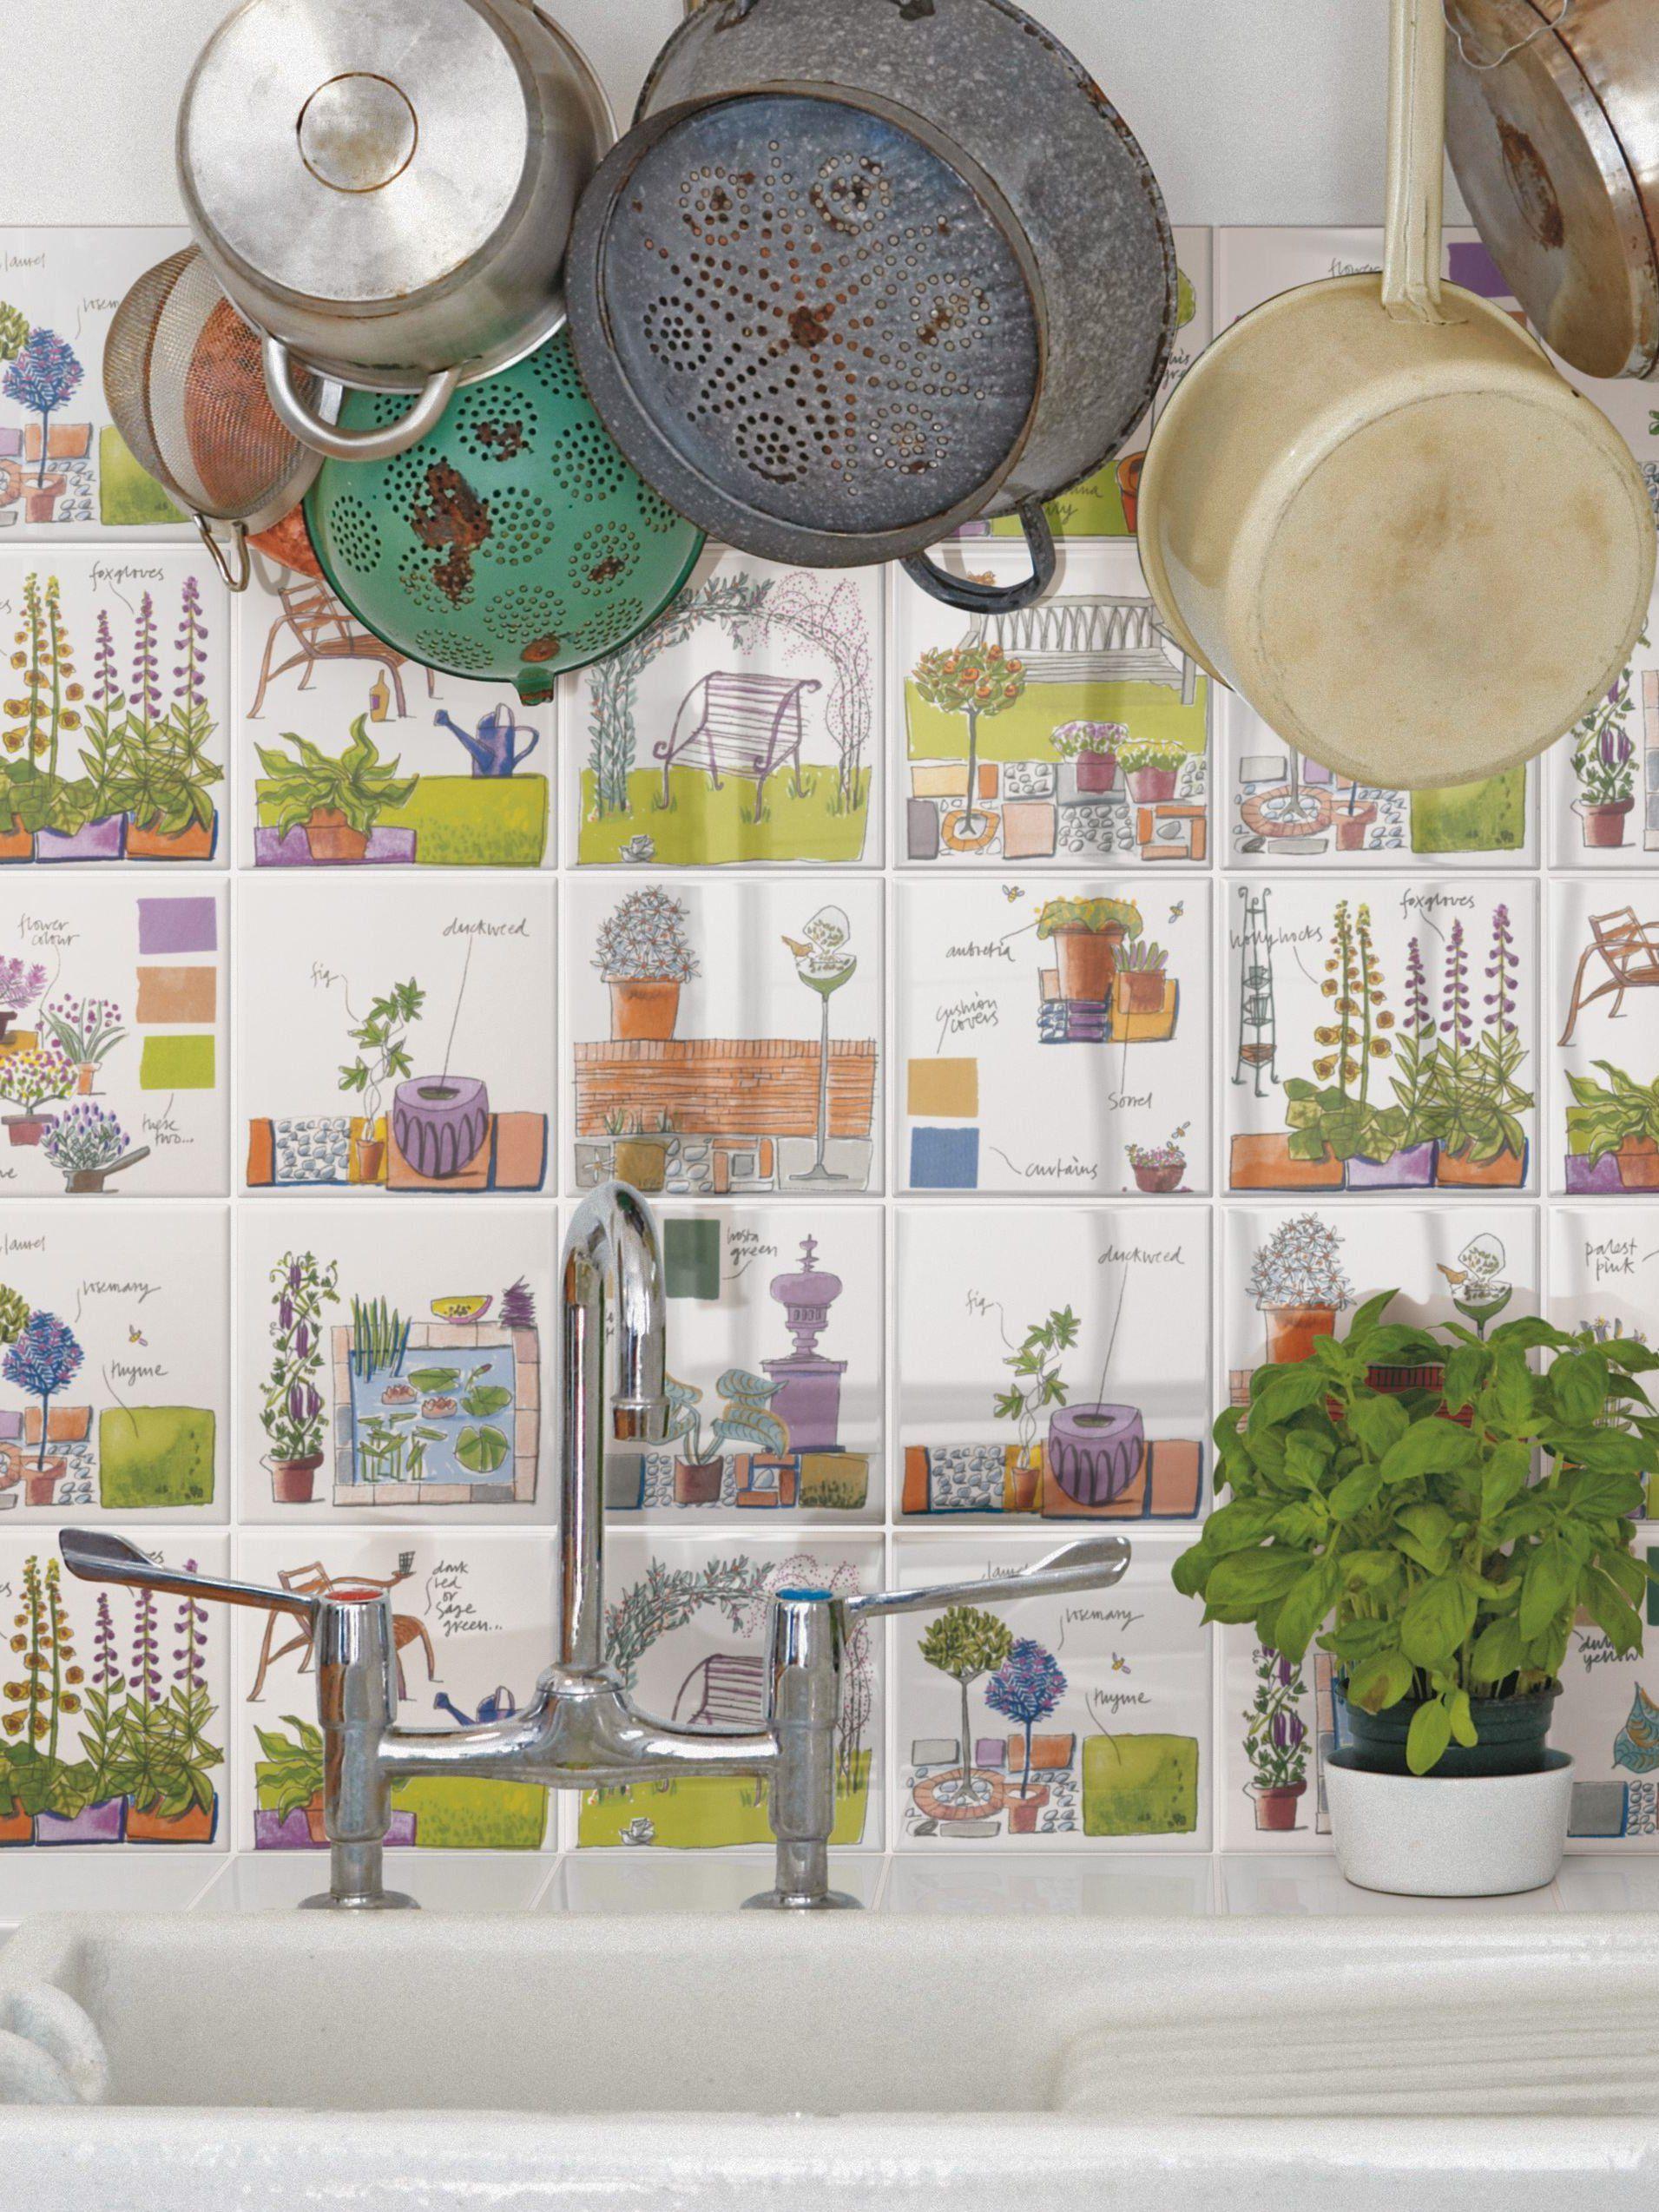 Garden Kitchen Wall Tiles Mary Ann By Ceramica Bardelli Design Julia Binfield